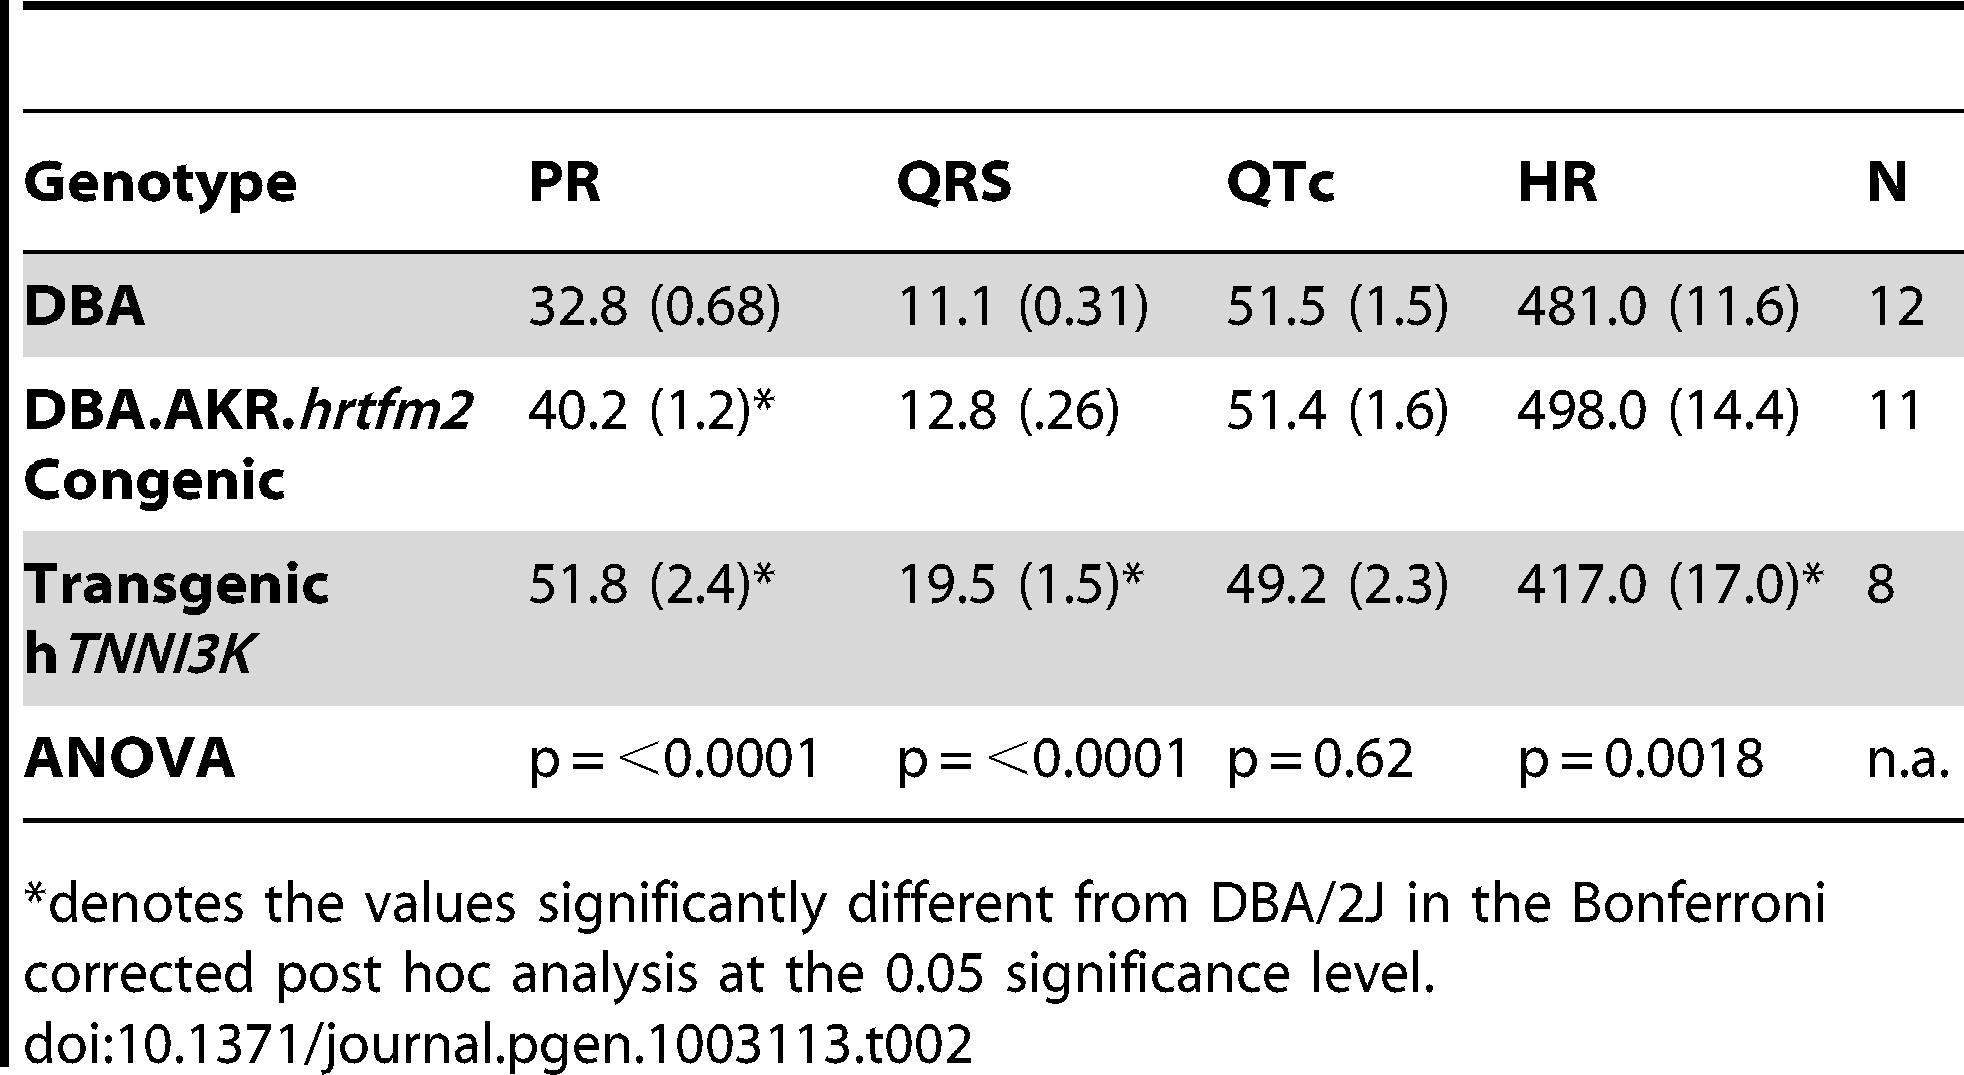 Overview of the ECG results mean (st.err) in DBA/2J, DBA.AKR.<i>hrtfm2</i> and transgenic <i>hTnni3k</i> mice.